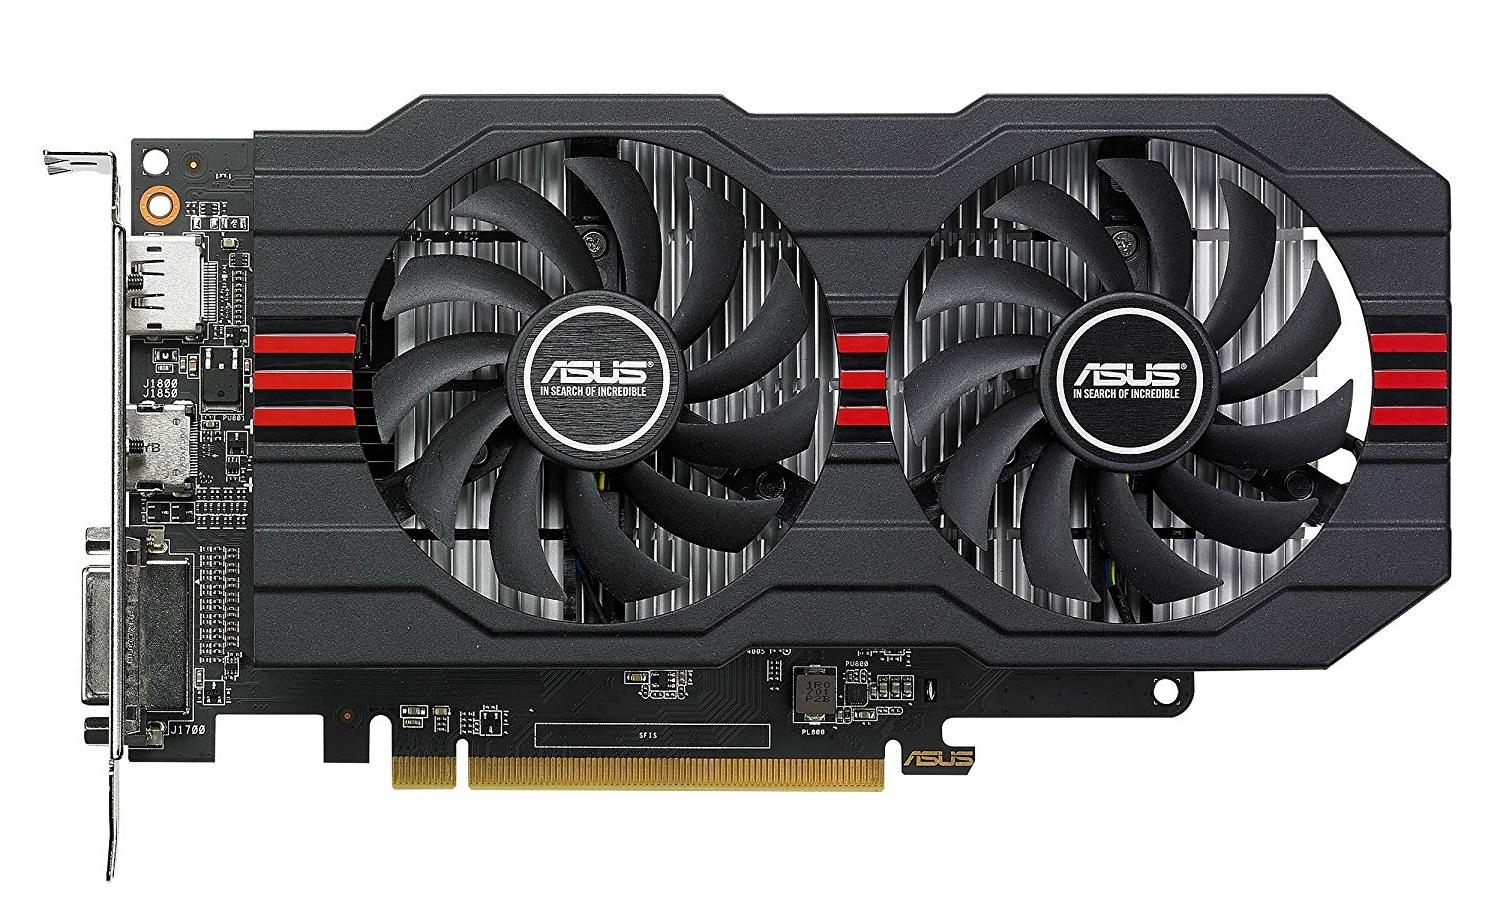 ASUS ROG Strix Radeon RX 560 Graphics Card